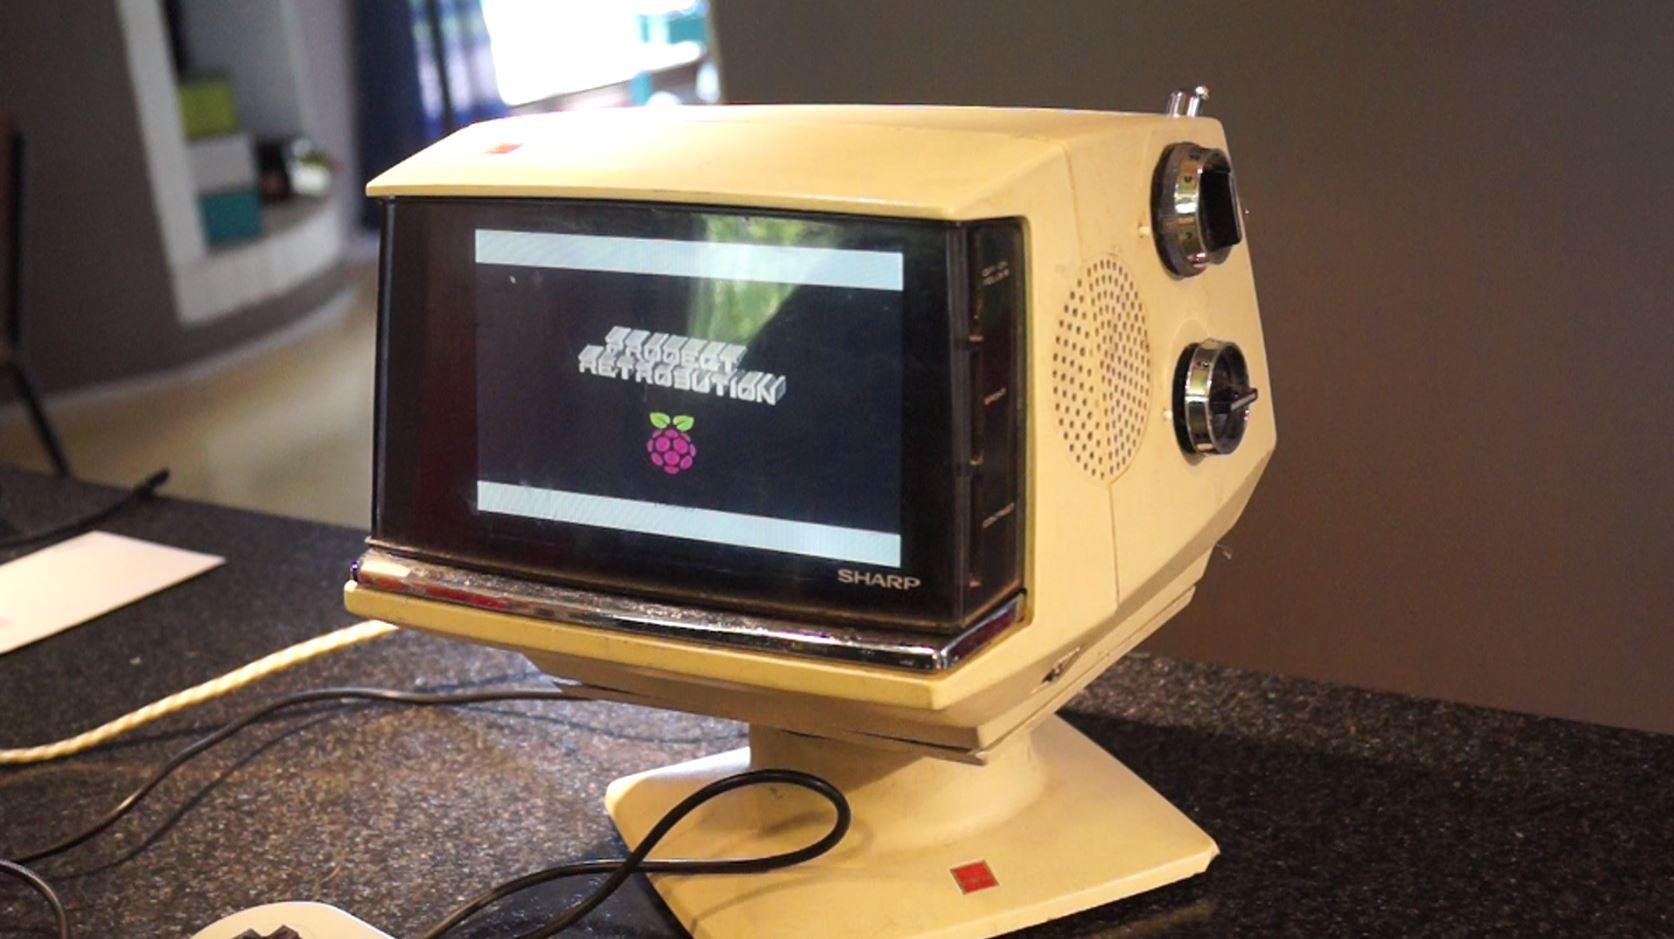 Converting a Retro Portable TV into a Raspberry Pi Video Game Console the Easy Way